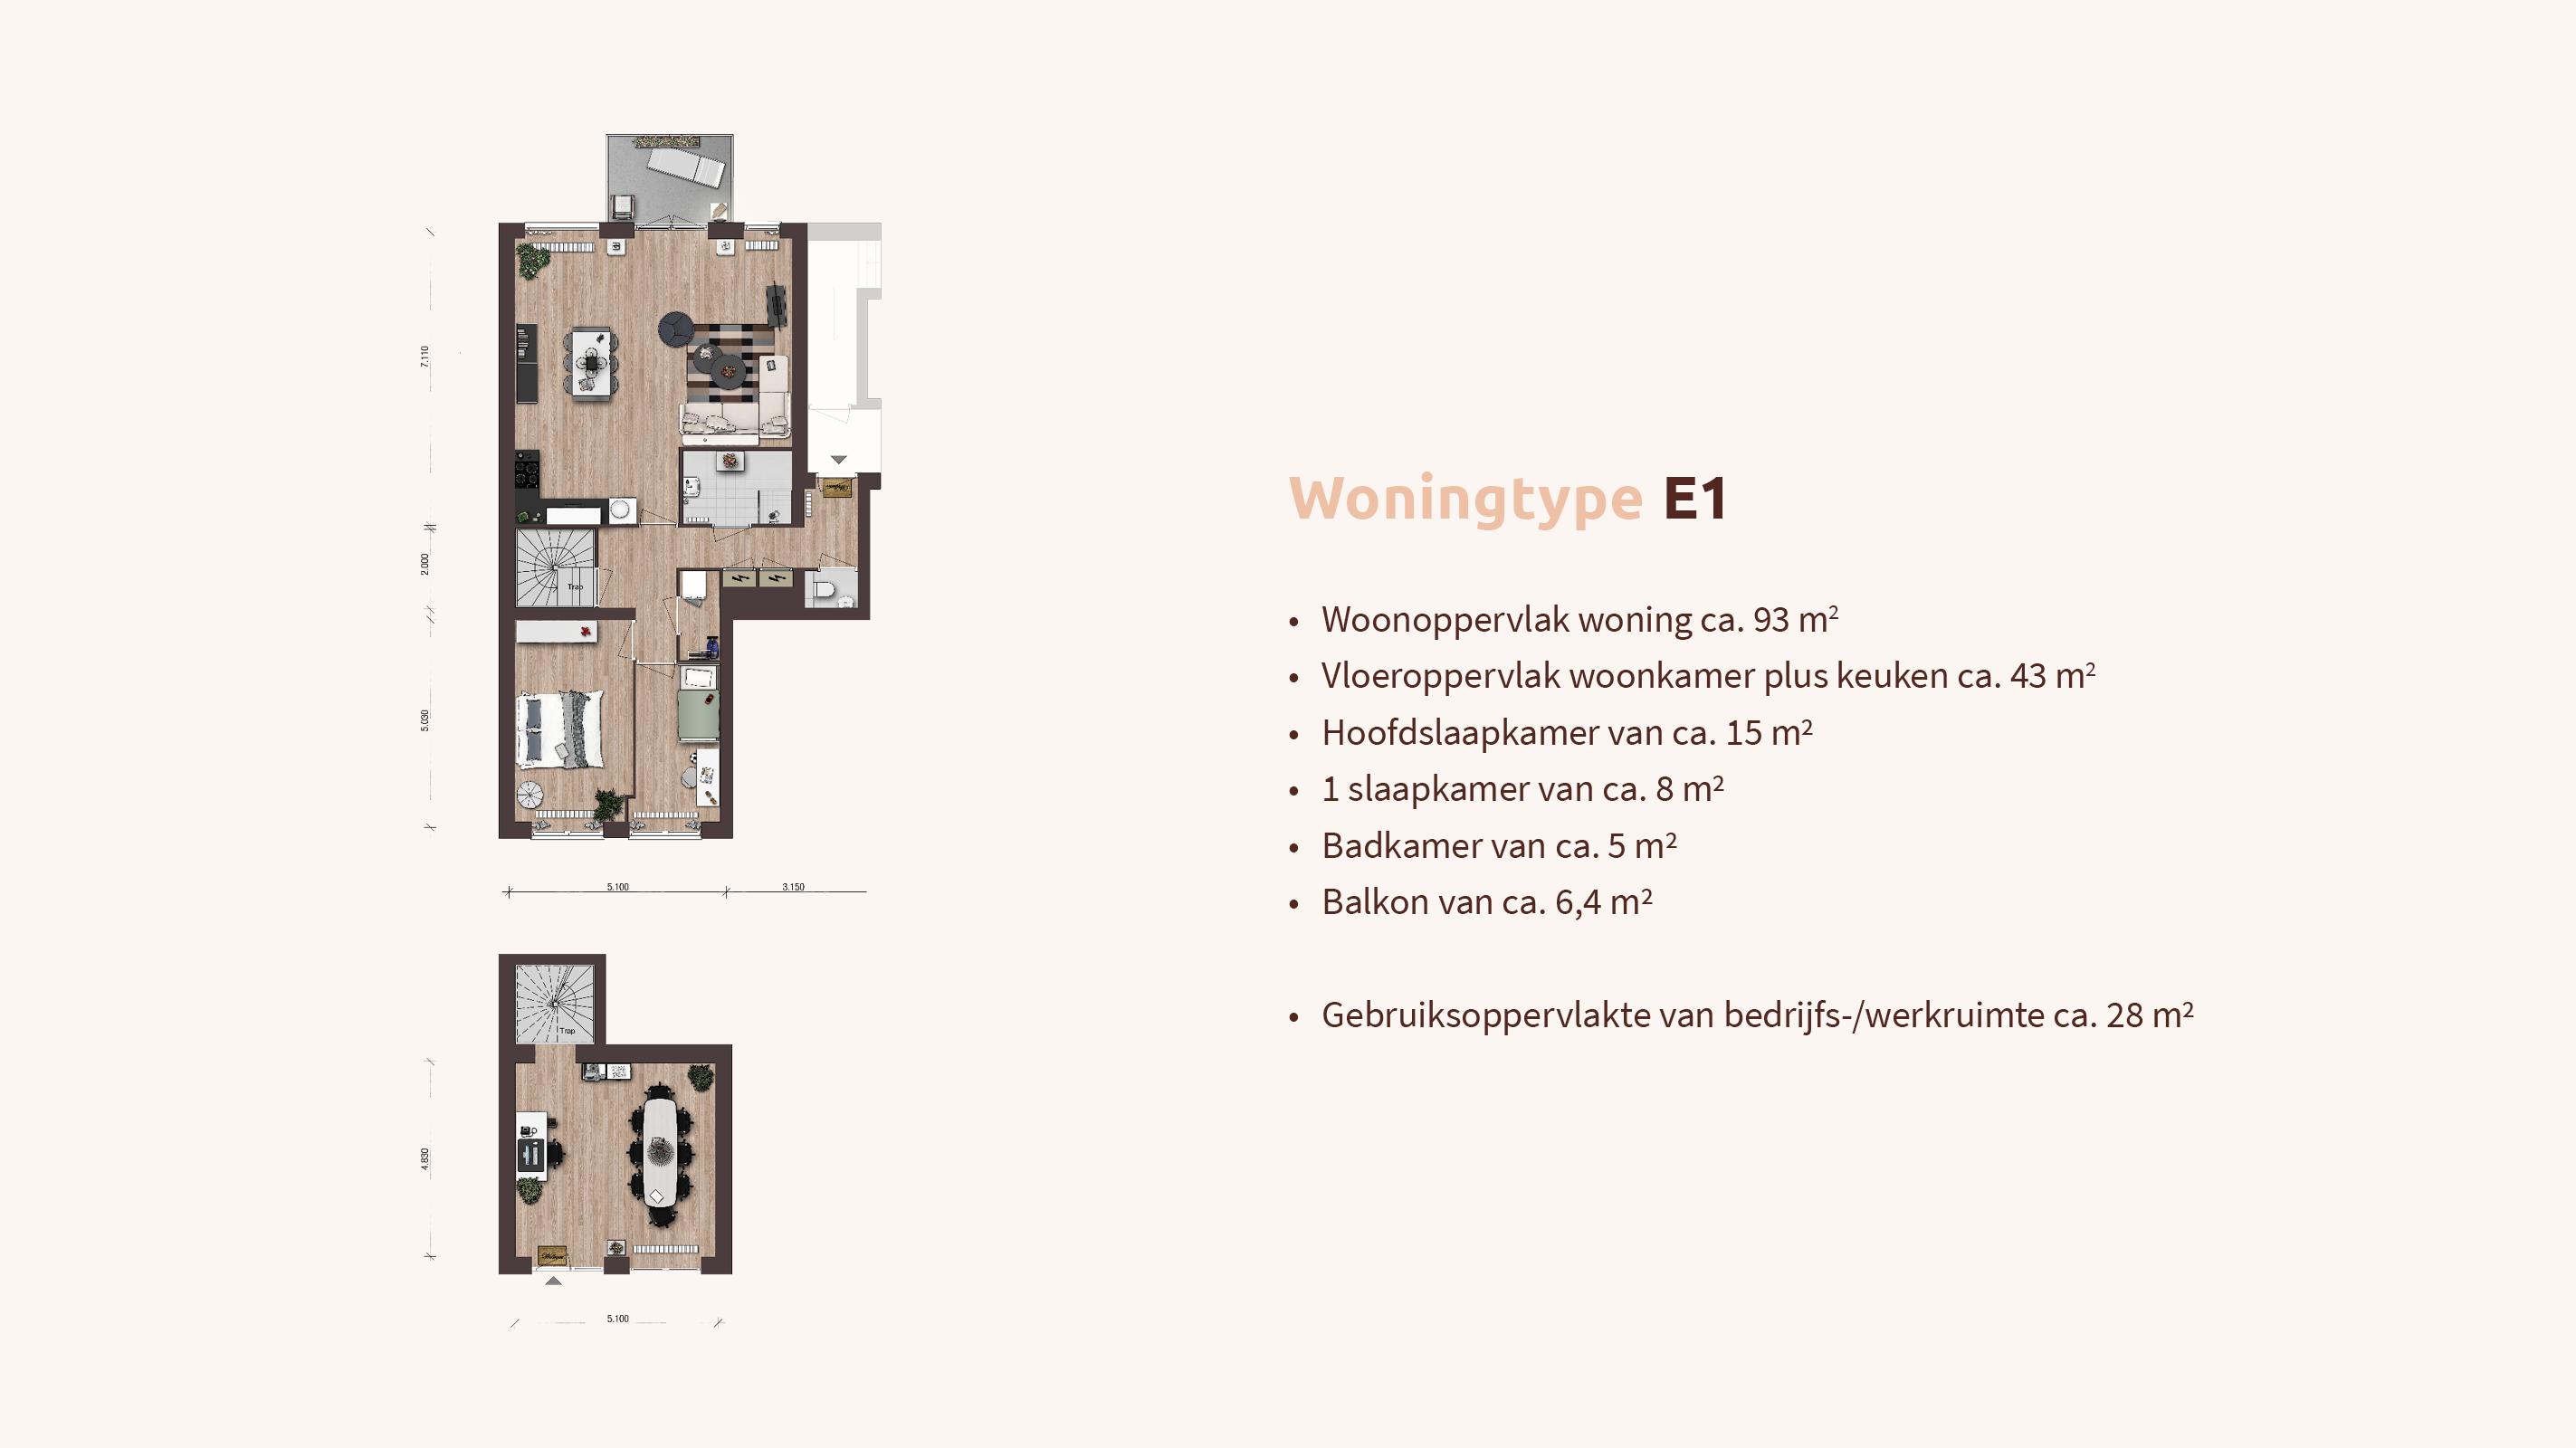 Woningtype - Woon-werk - Plattegrond E1 - Appartementen Leidsche Rijn - Picaz Utrecht